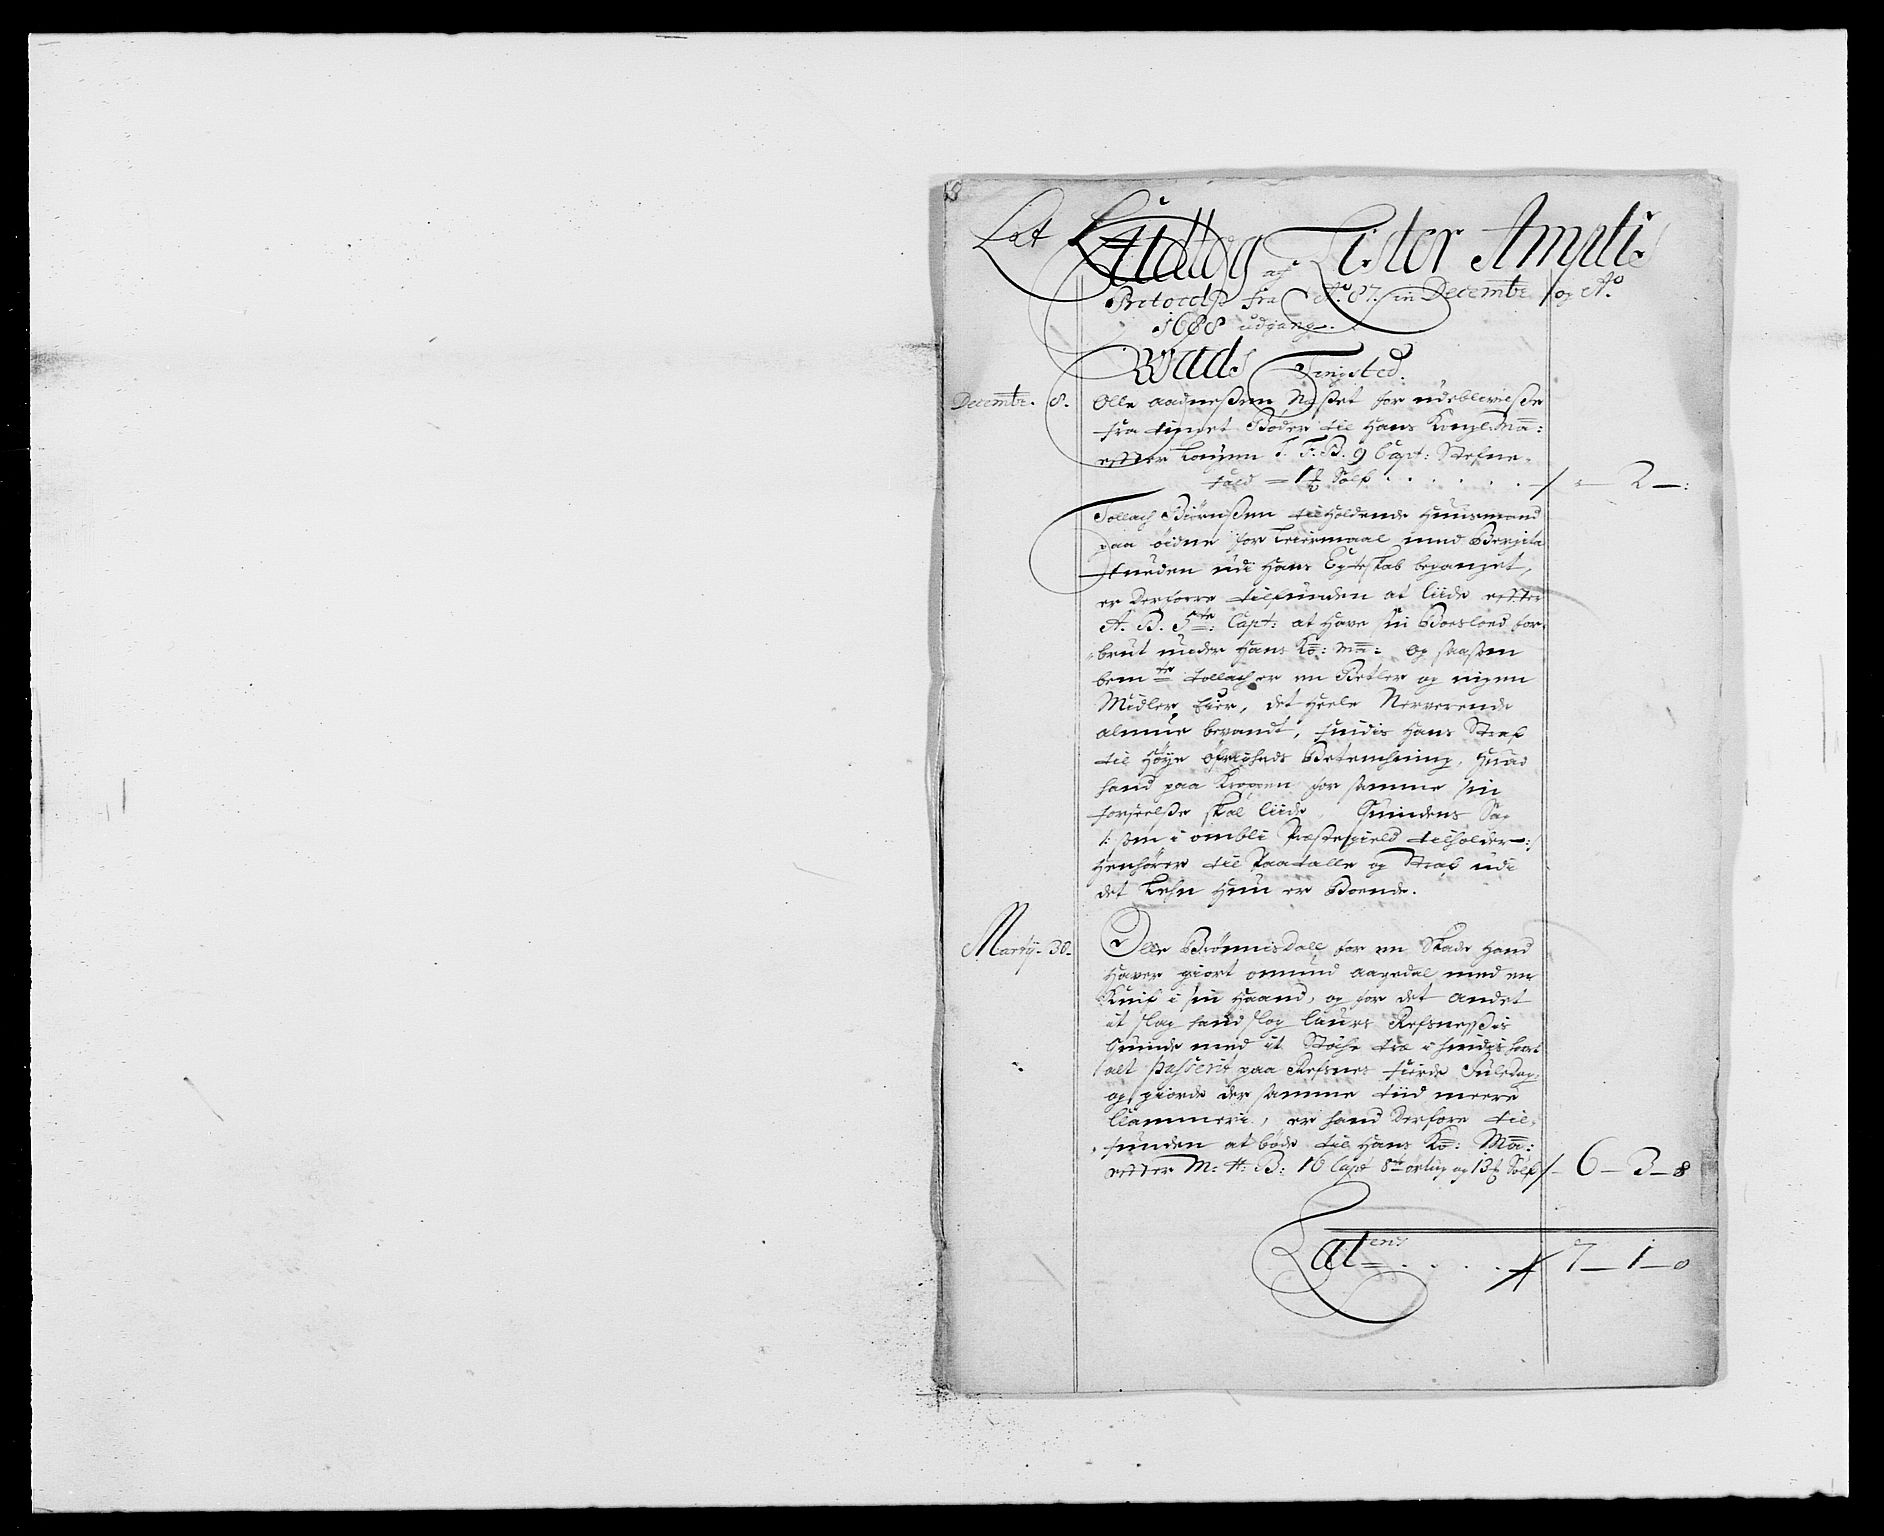 RA, Rentekammeret inntil 1814, Reviderte regnskaper, Fogderegnskap, R41/L2534: Fogderegnskap Lista, 1686-1688, s. 192